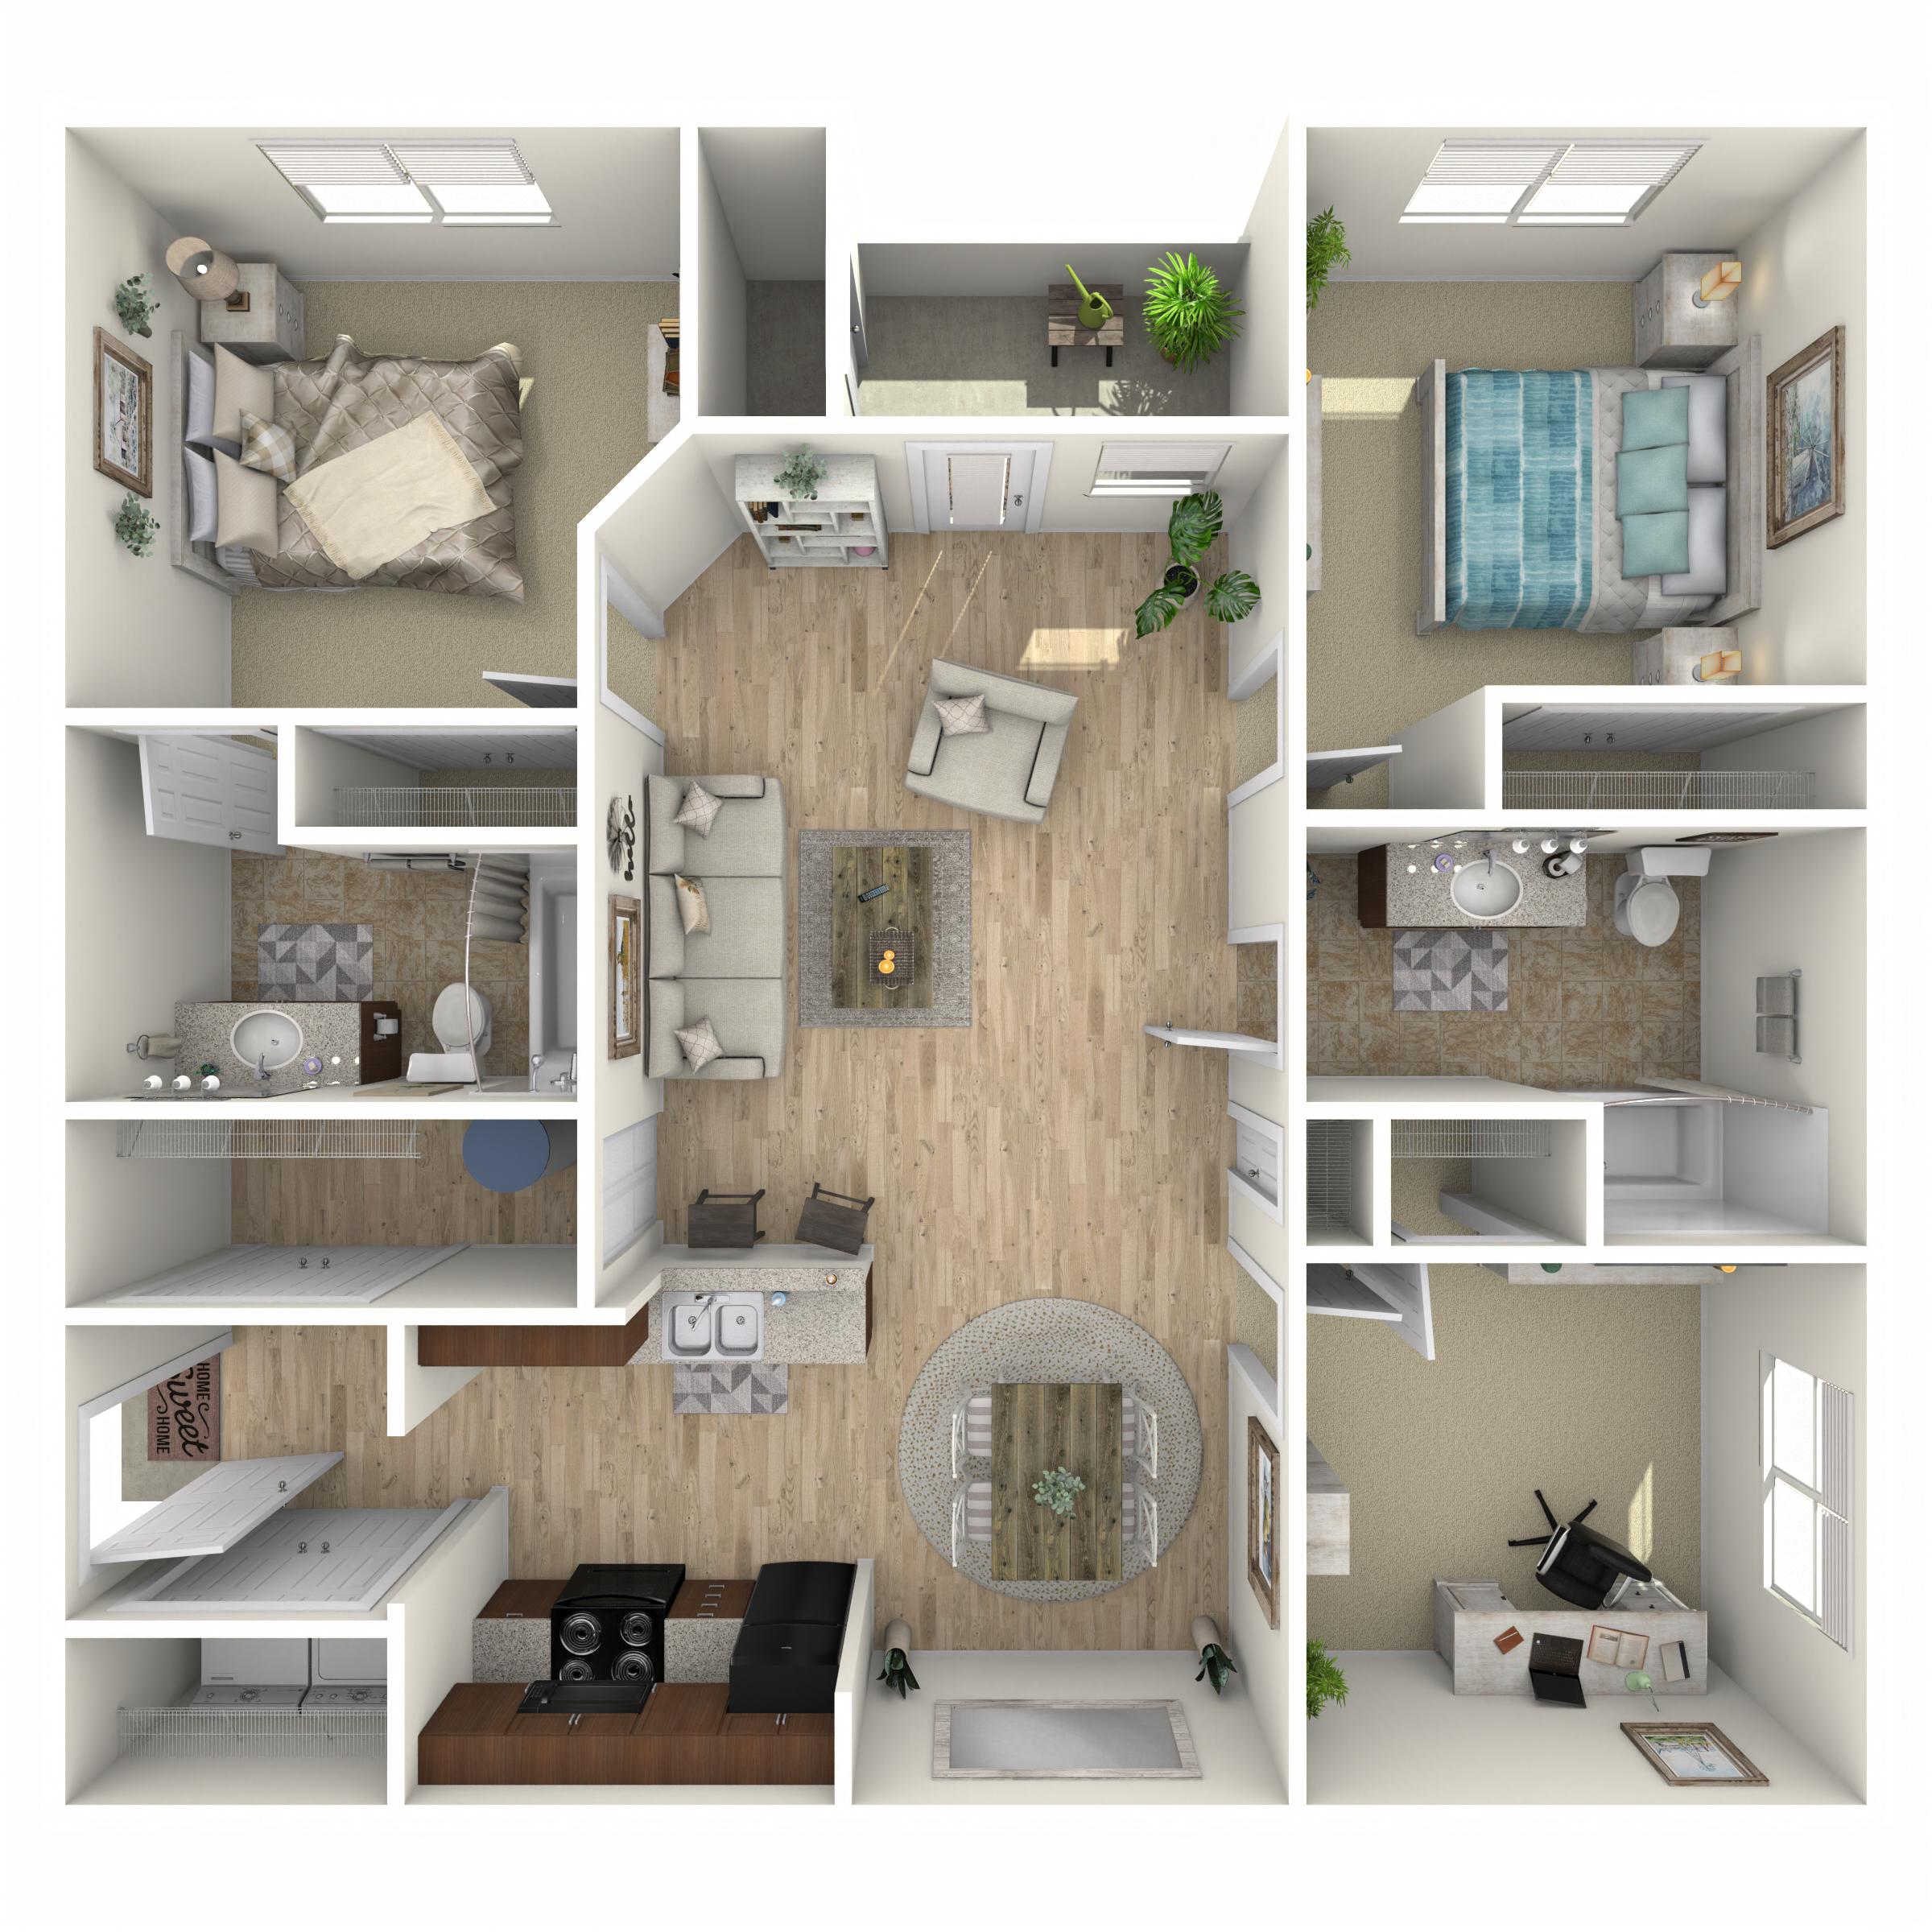 2 Bed 2 Bath C floor plan image